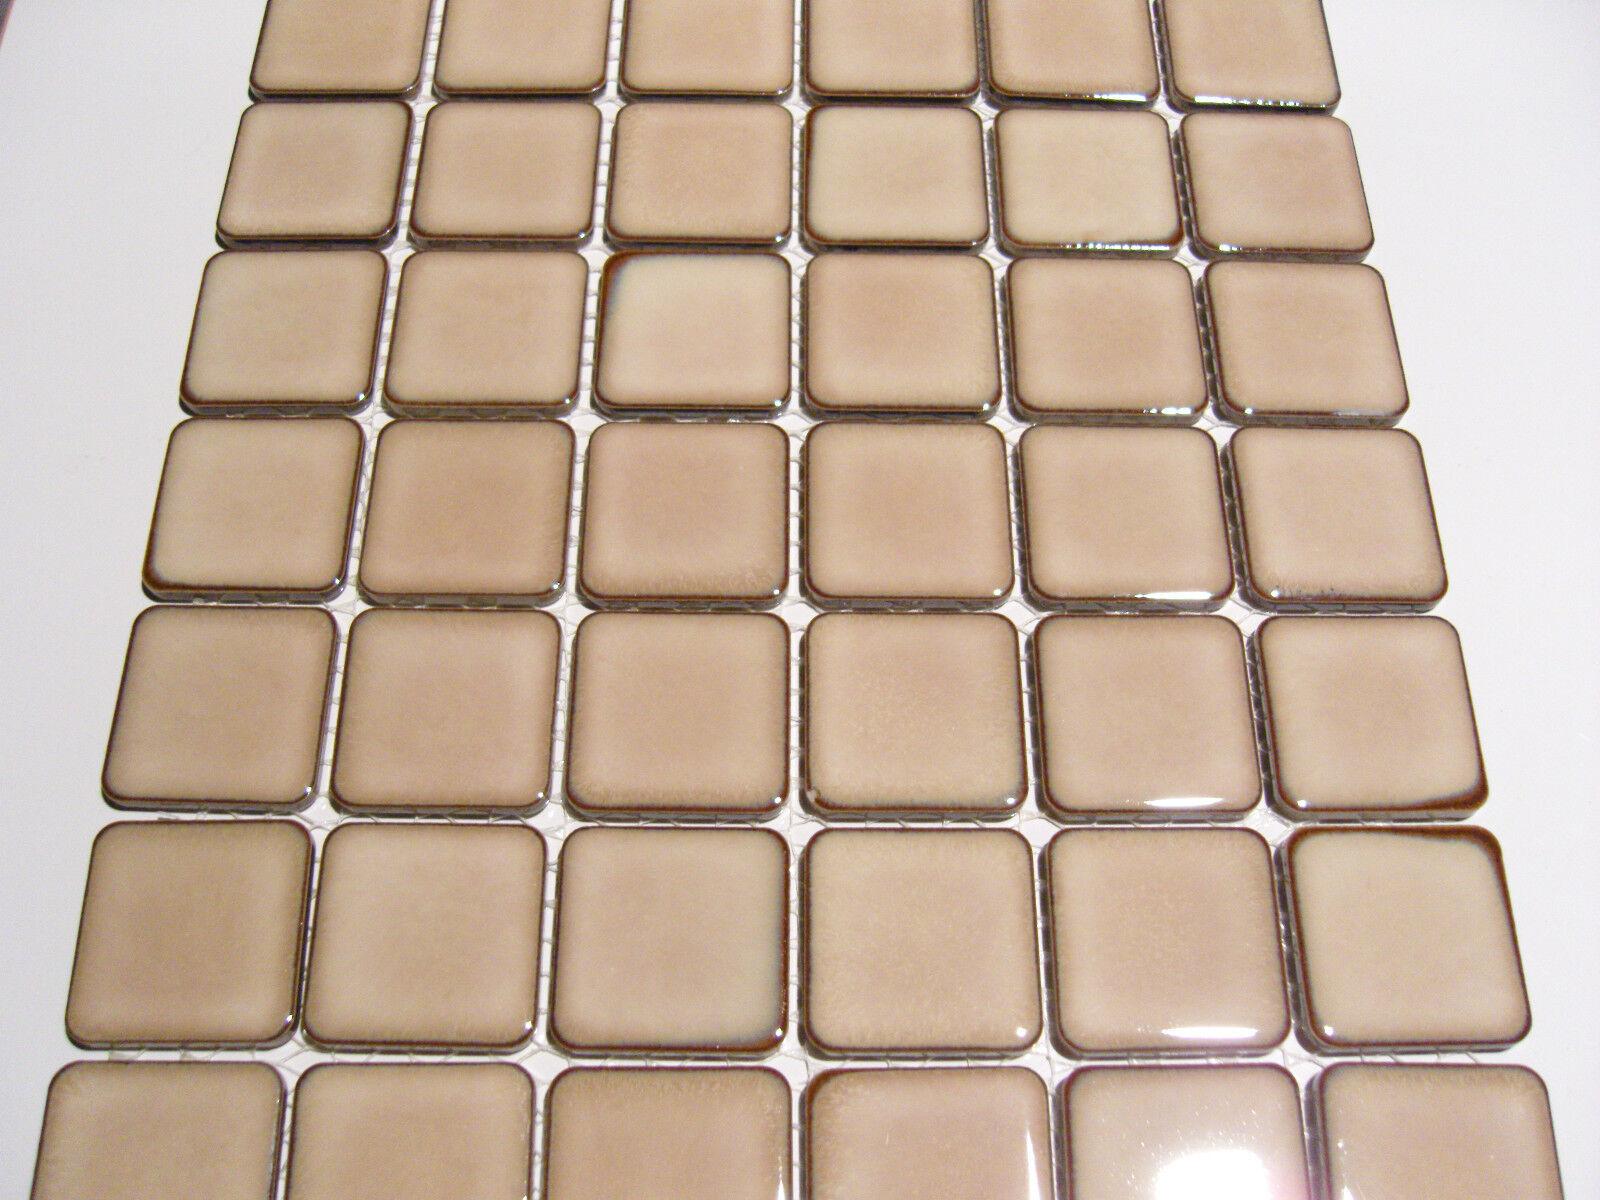 0,95 qm - Mosaik Fliesen Feinsteinzeug braun  45mm x 55mm - CB 260 RC Keramik